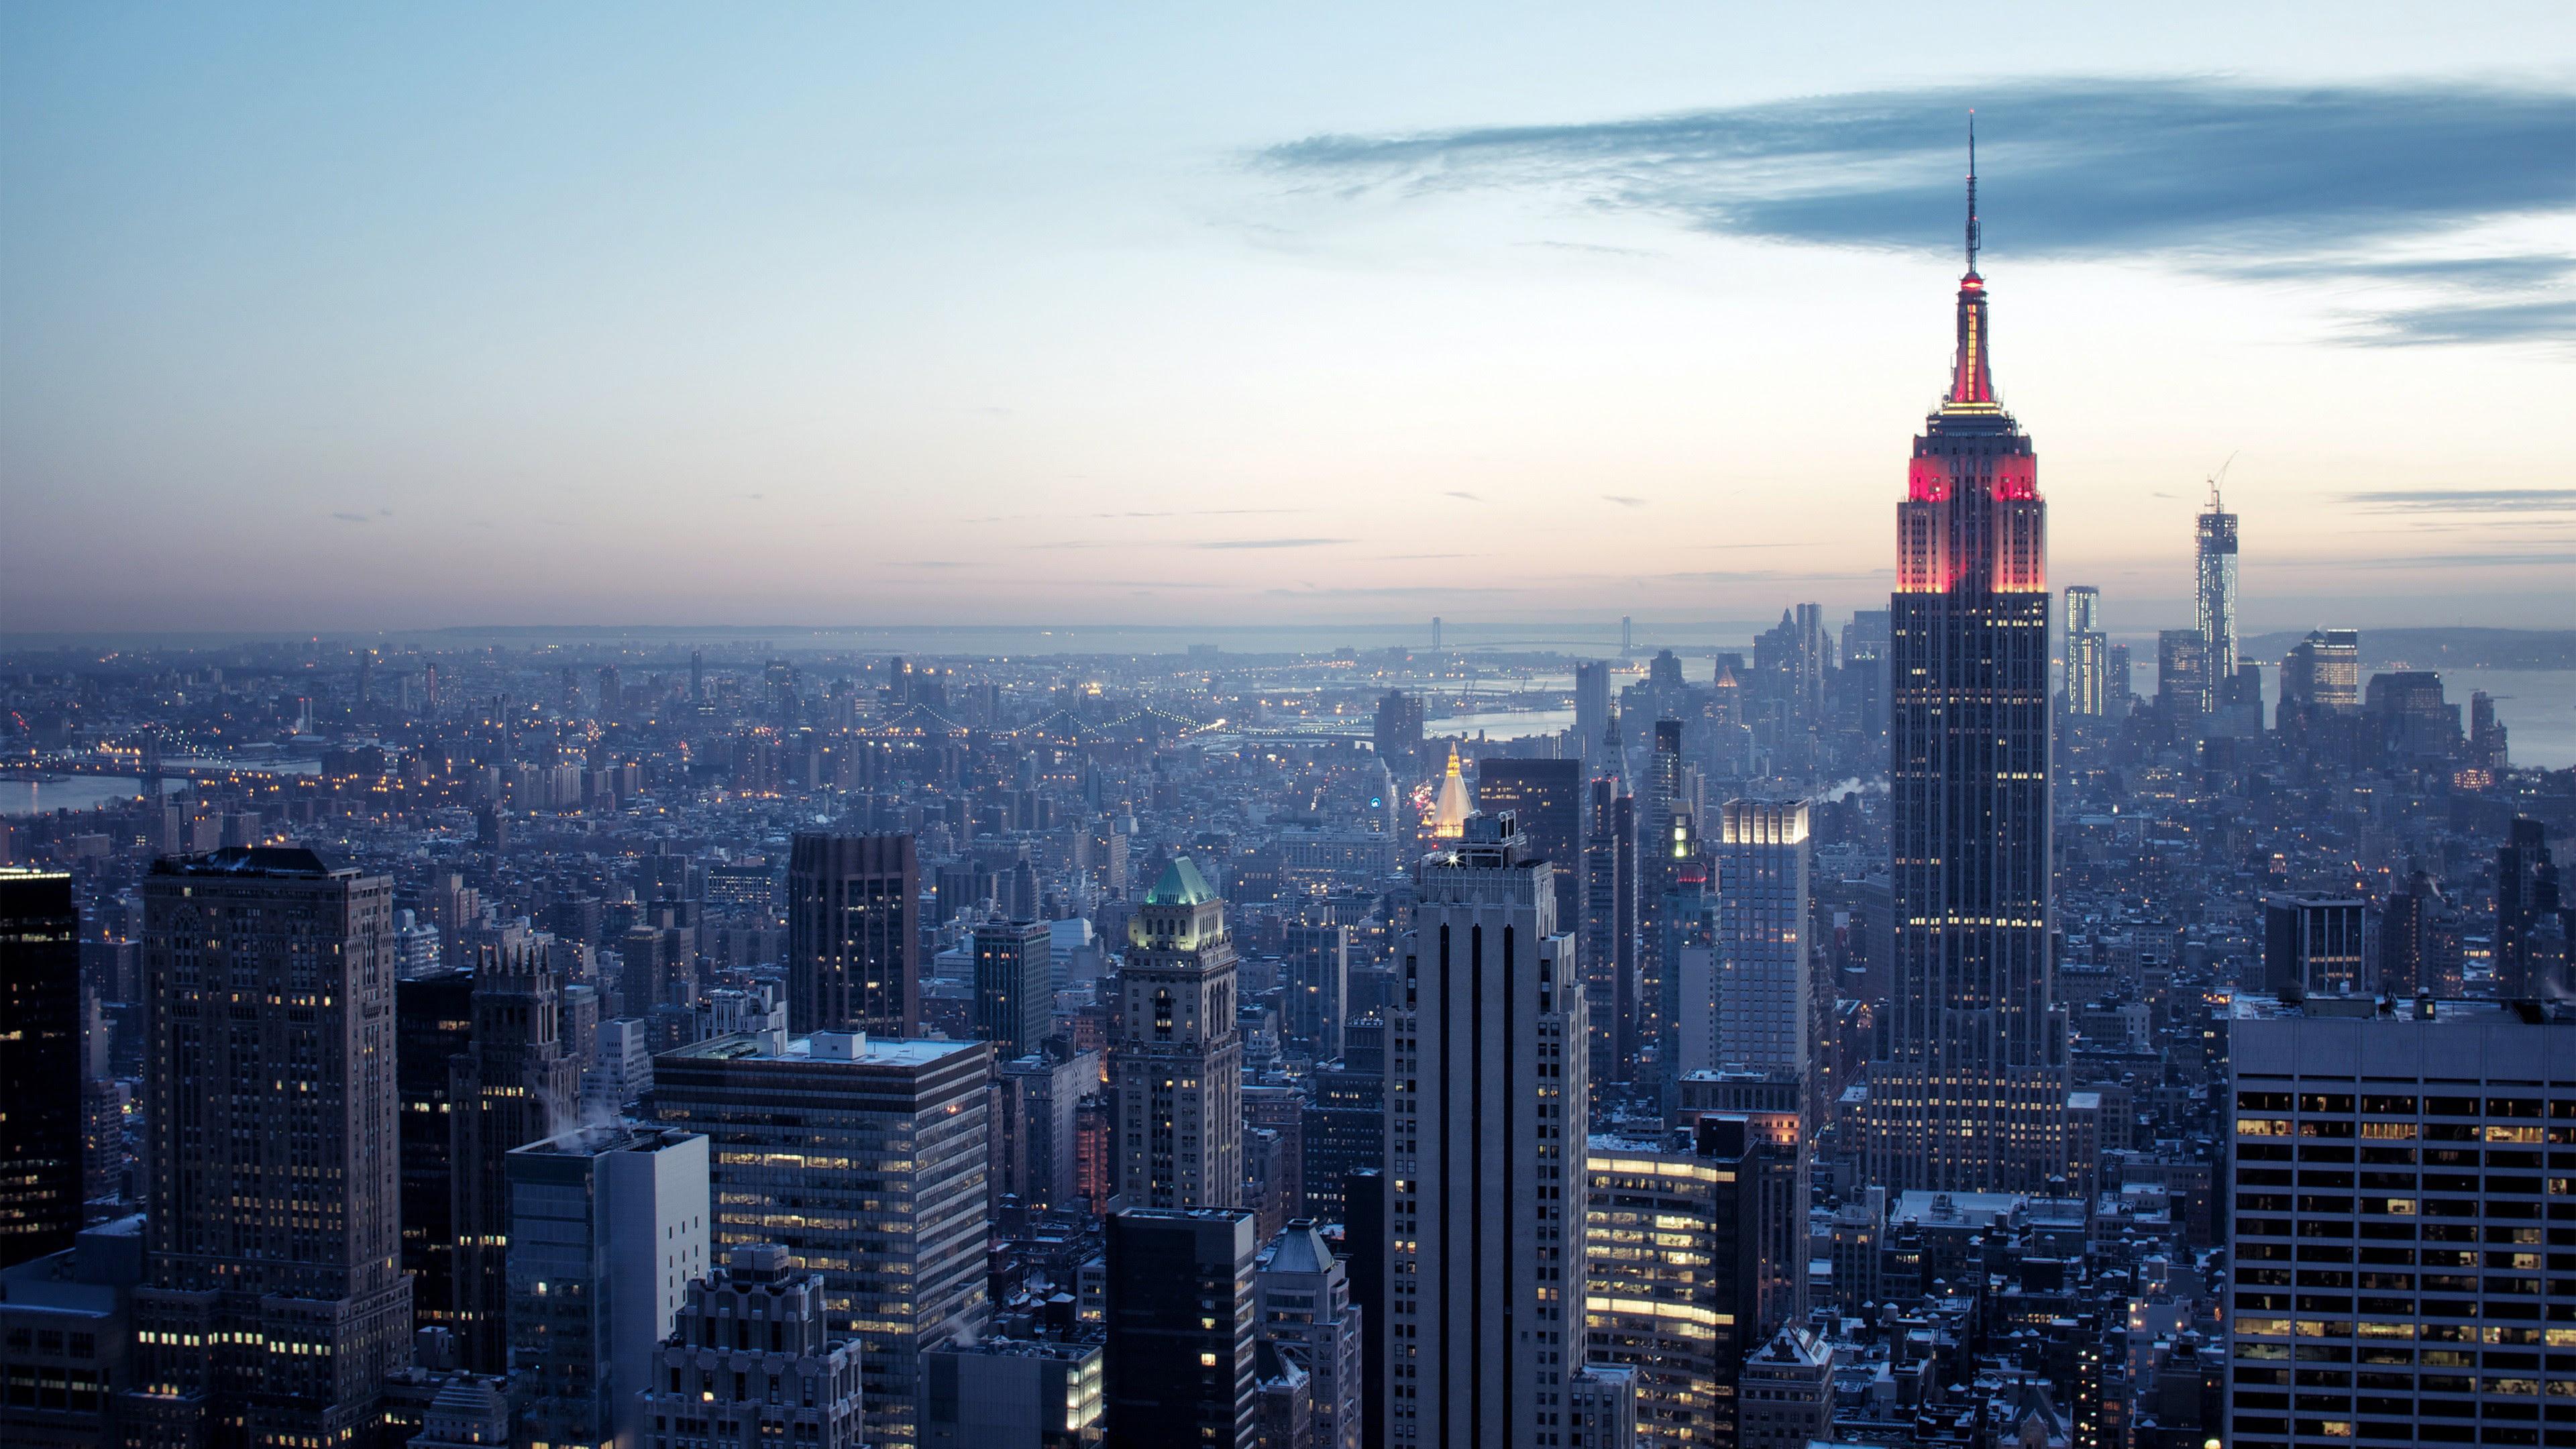 New York City Hd Wallpaper 75 Images